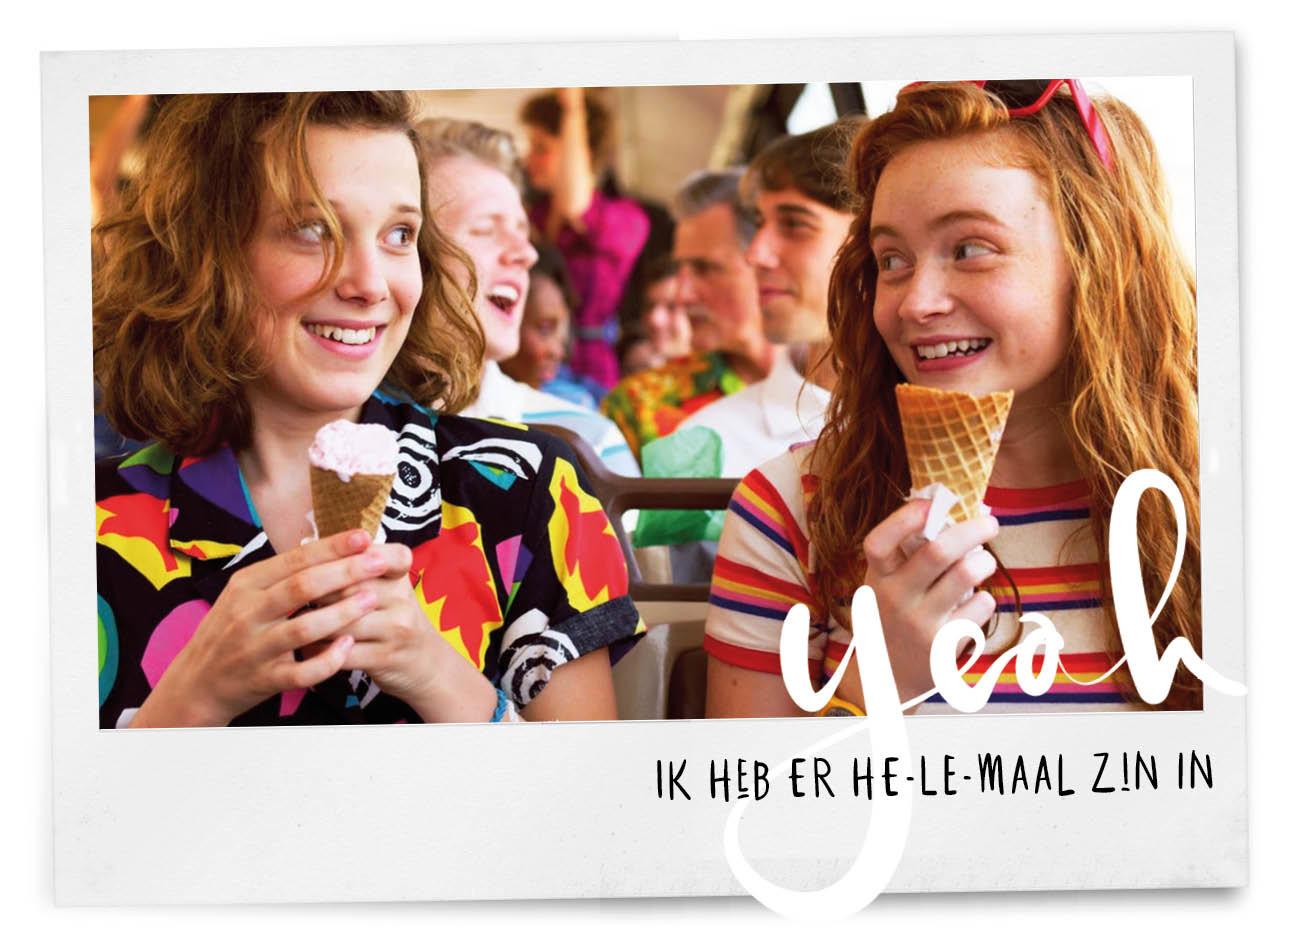 stranger things netflix seizoen 3 meisjes in de bus naar elkaar lachen met ijsje